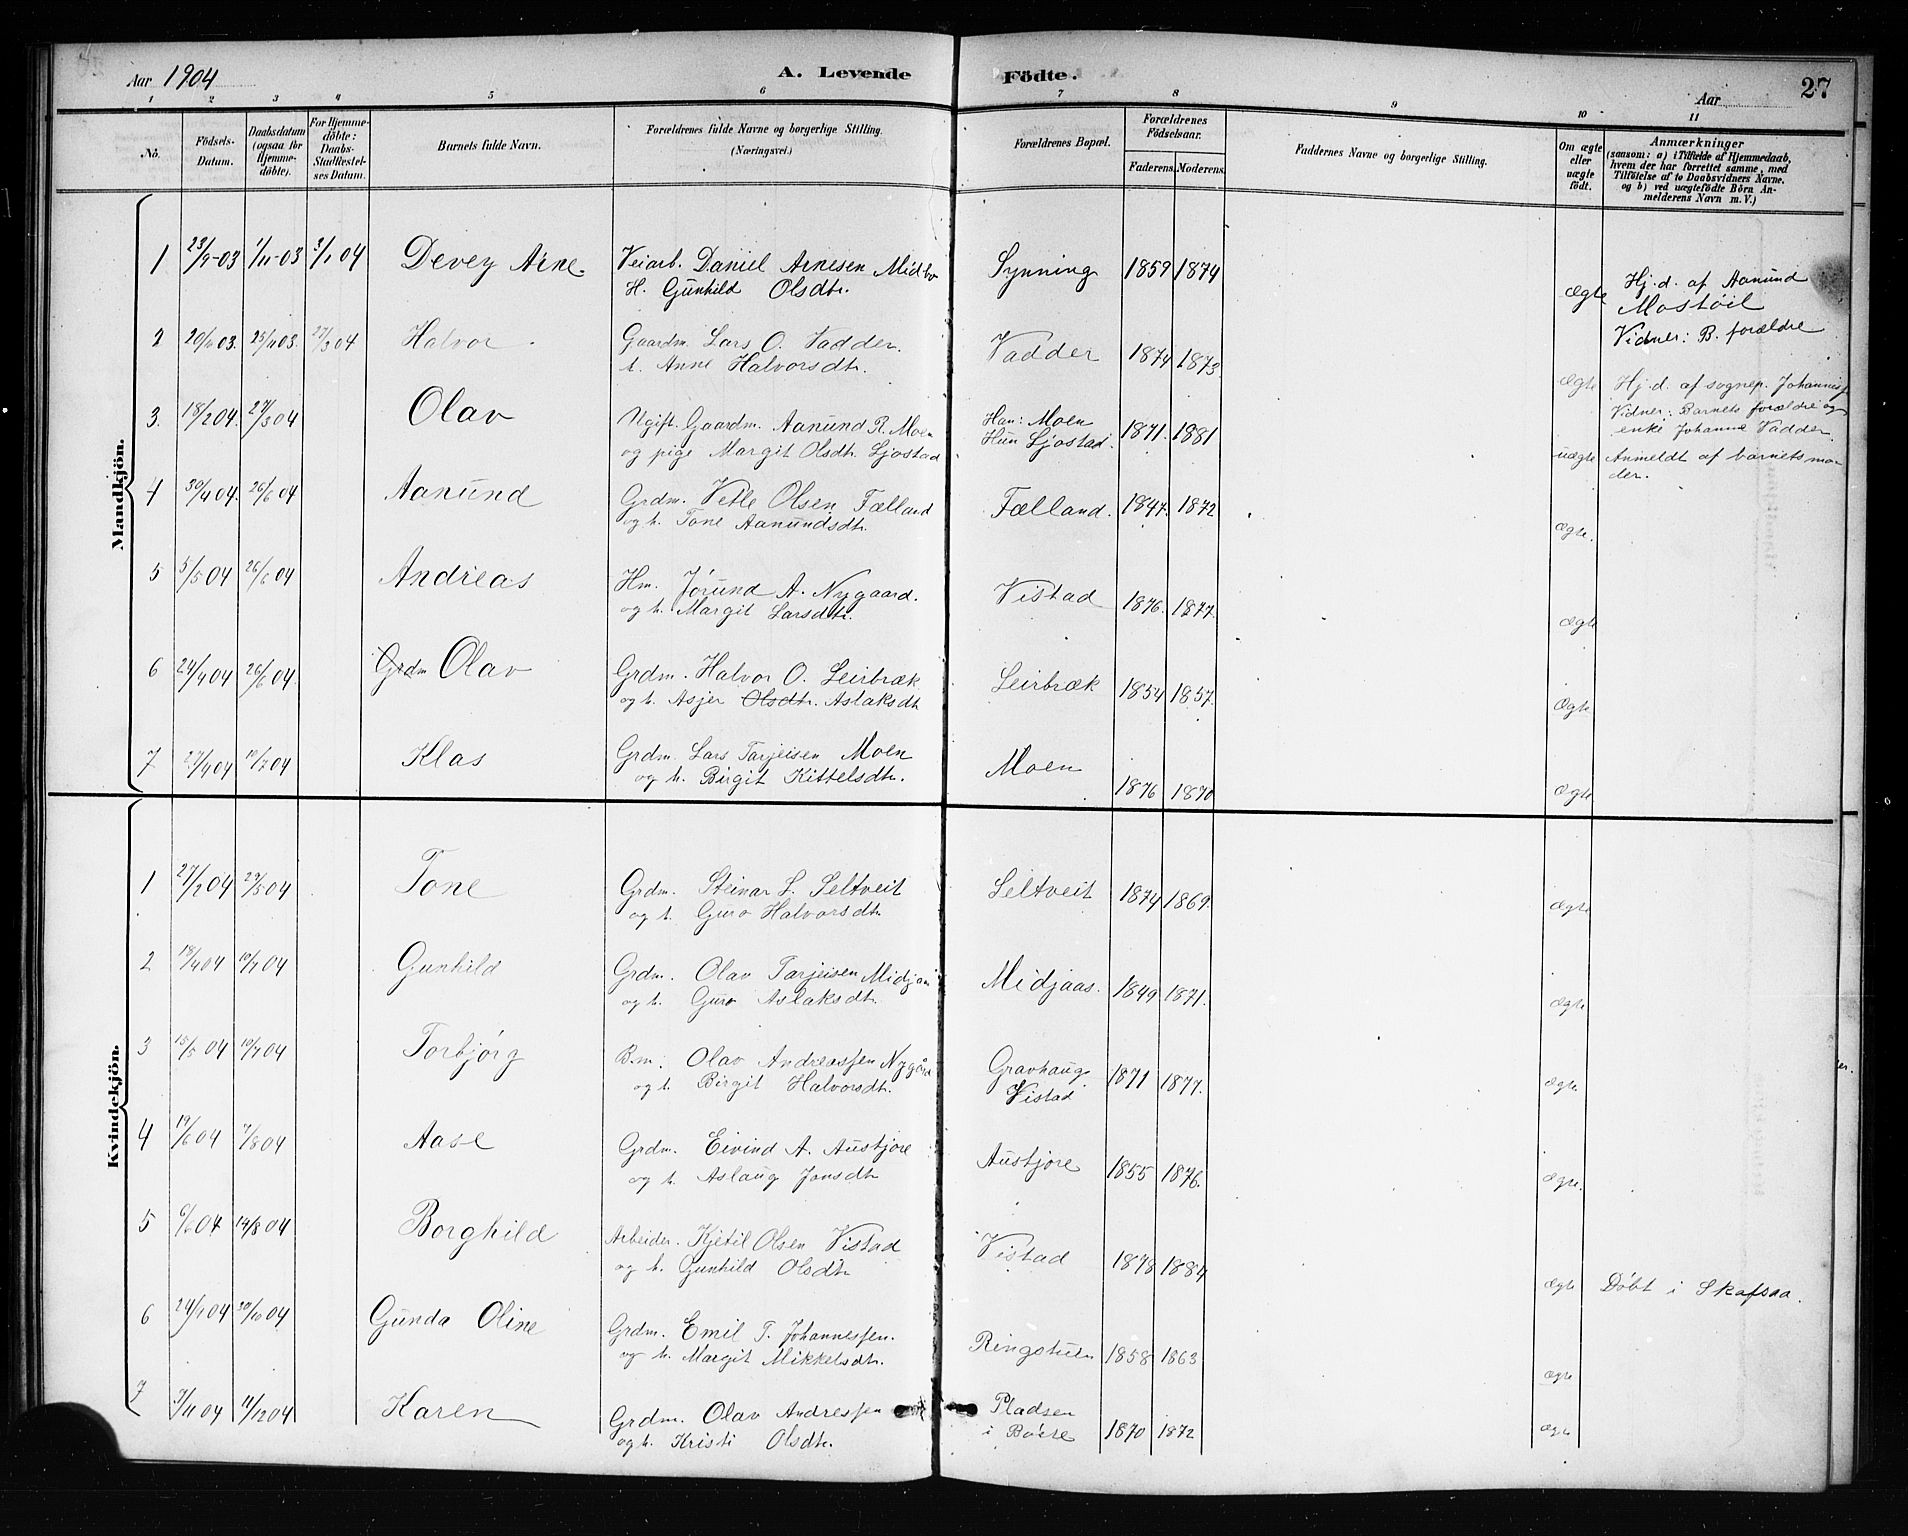 SAKO, Mo kirkebøker, G/Ga/L0002: Klokkerbok nr. I 2, 1892-1914, s. 27